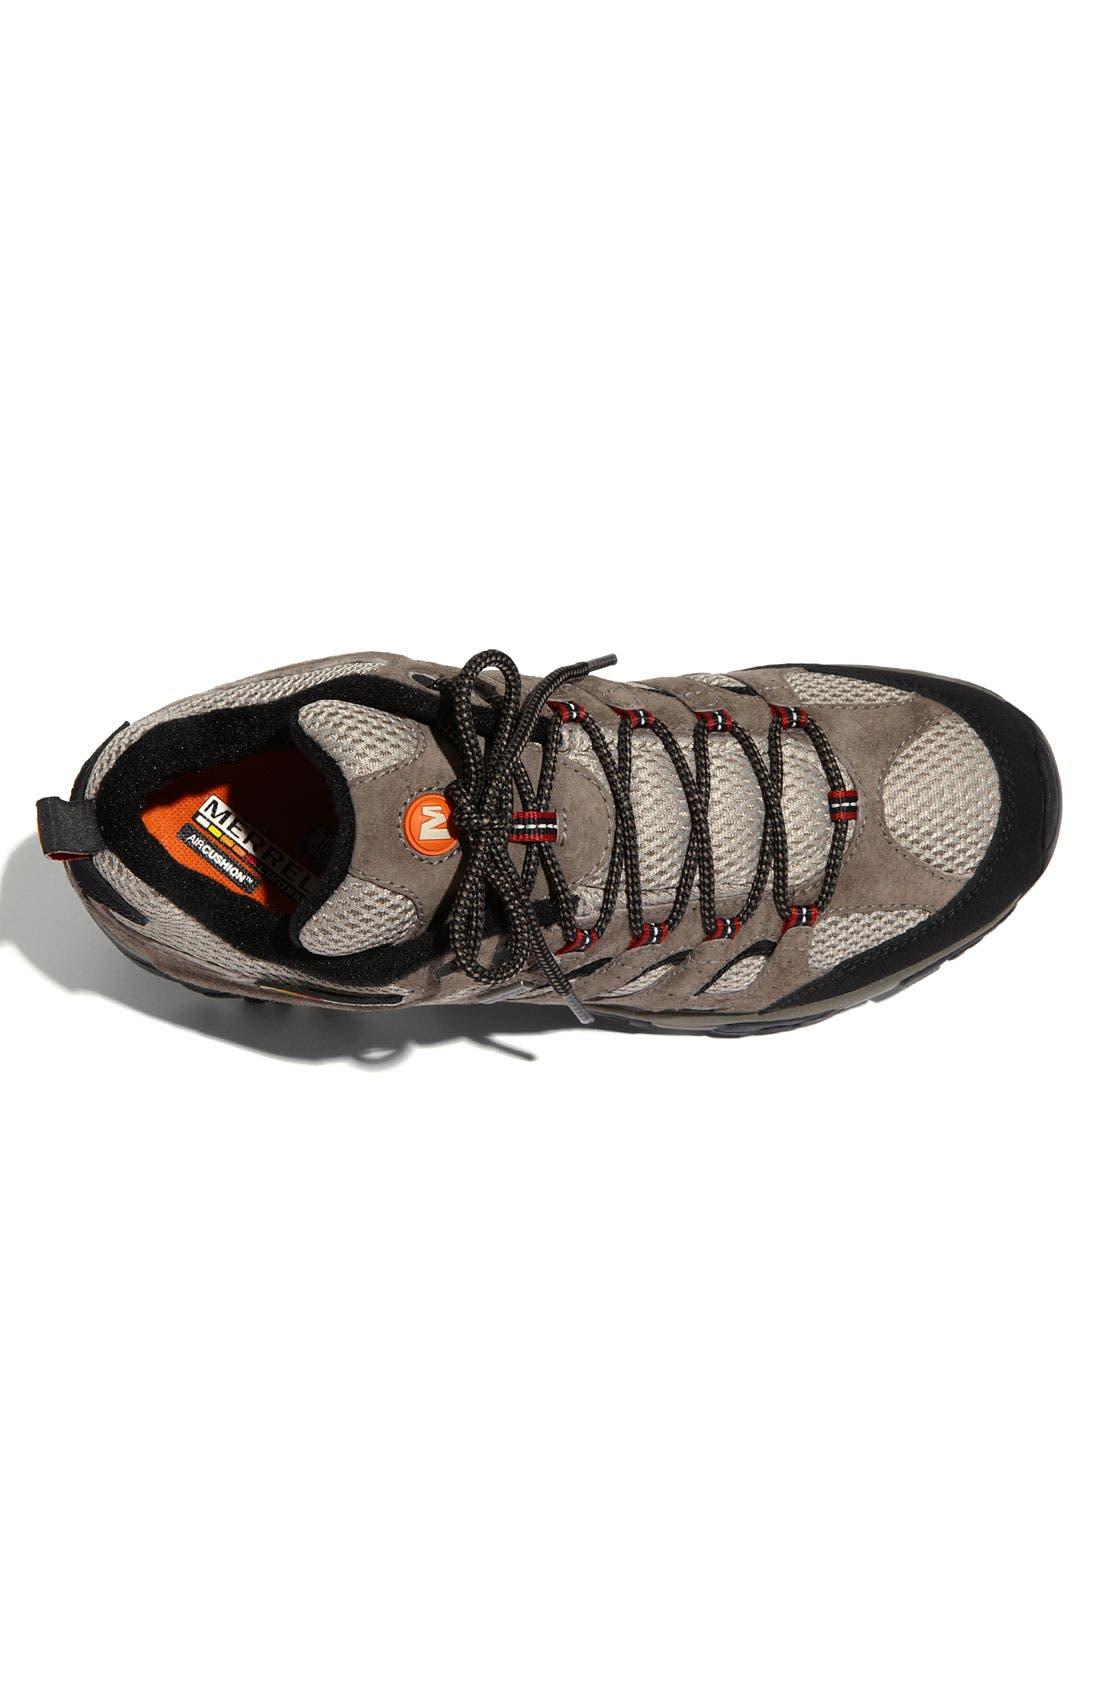 Alternate Image 3  - Merrell 'Moab' Waterproof Hiking Shoe (Men)